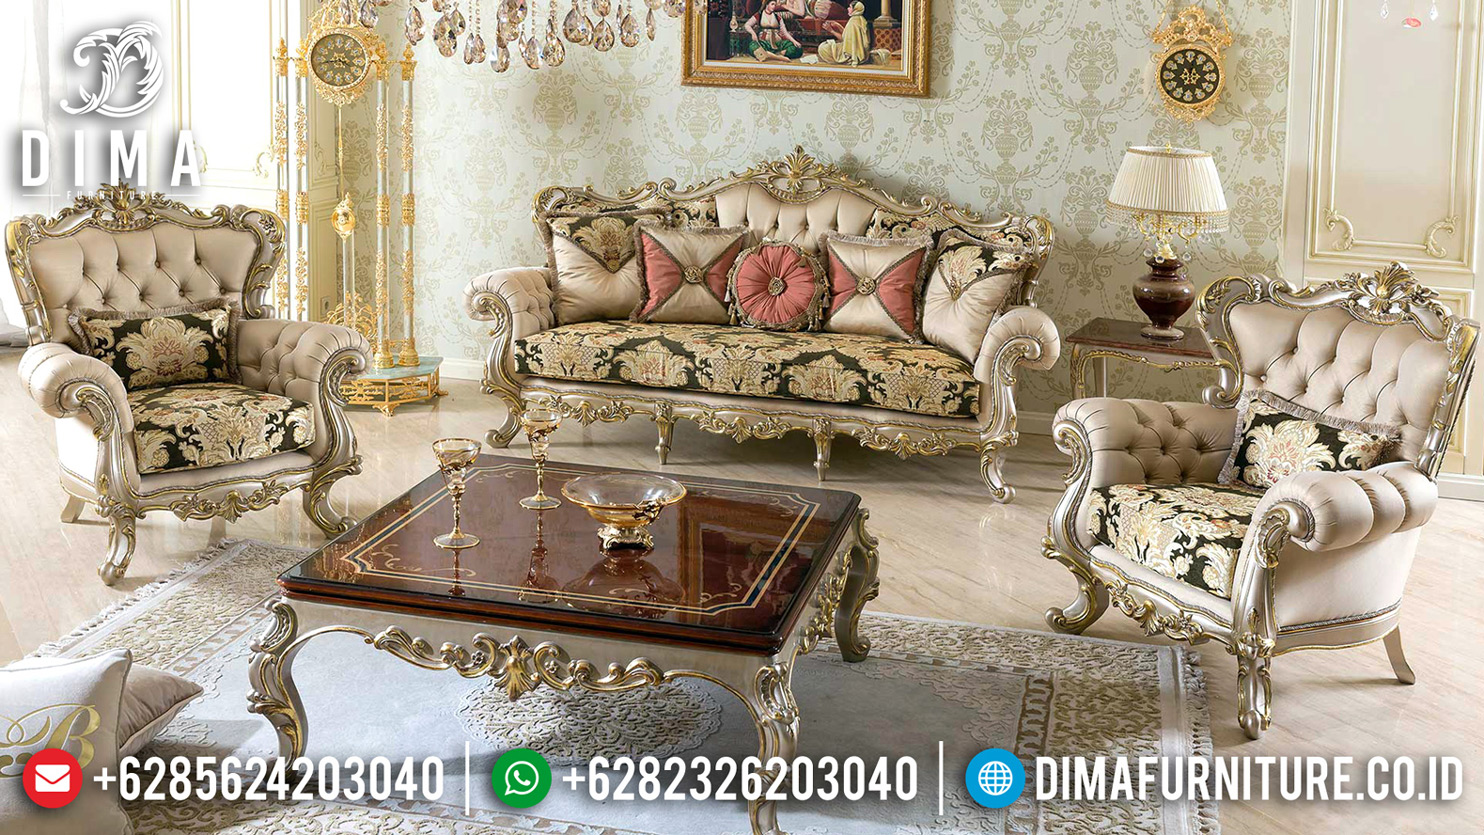 Sofa Tamu Mewah Turkish Koltuk Furniture Luxury Carving TTJ-0630